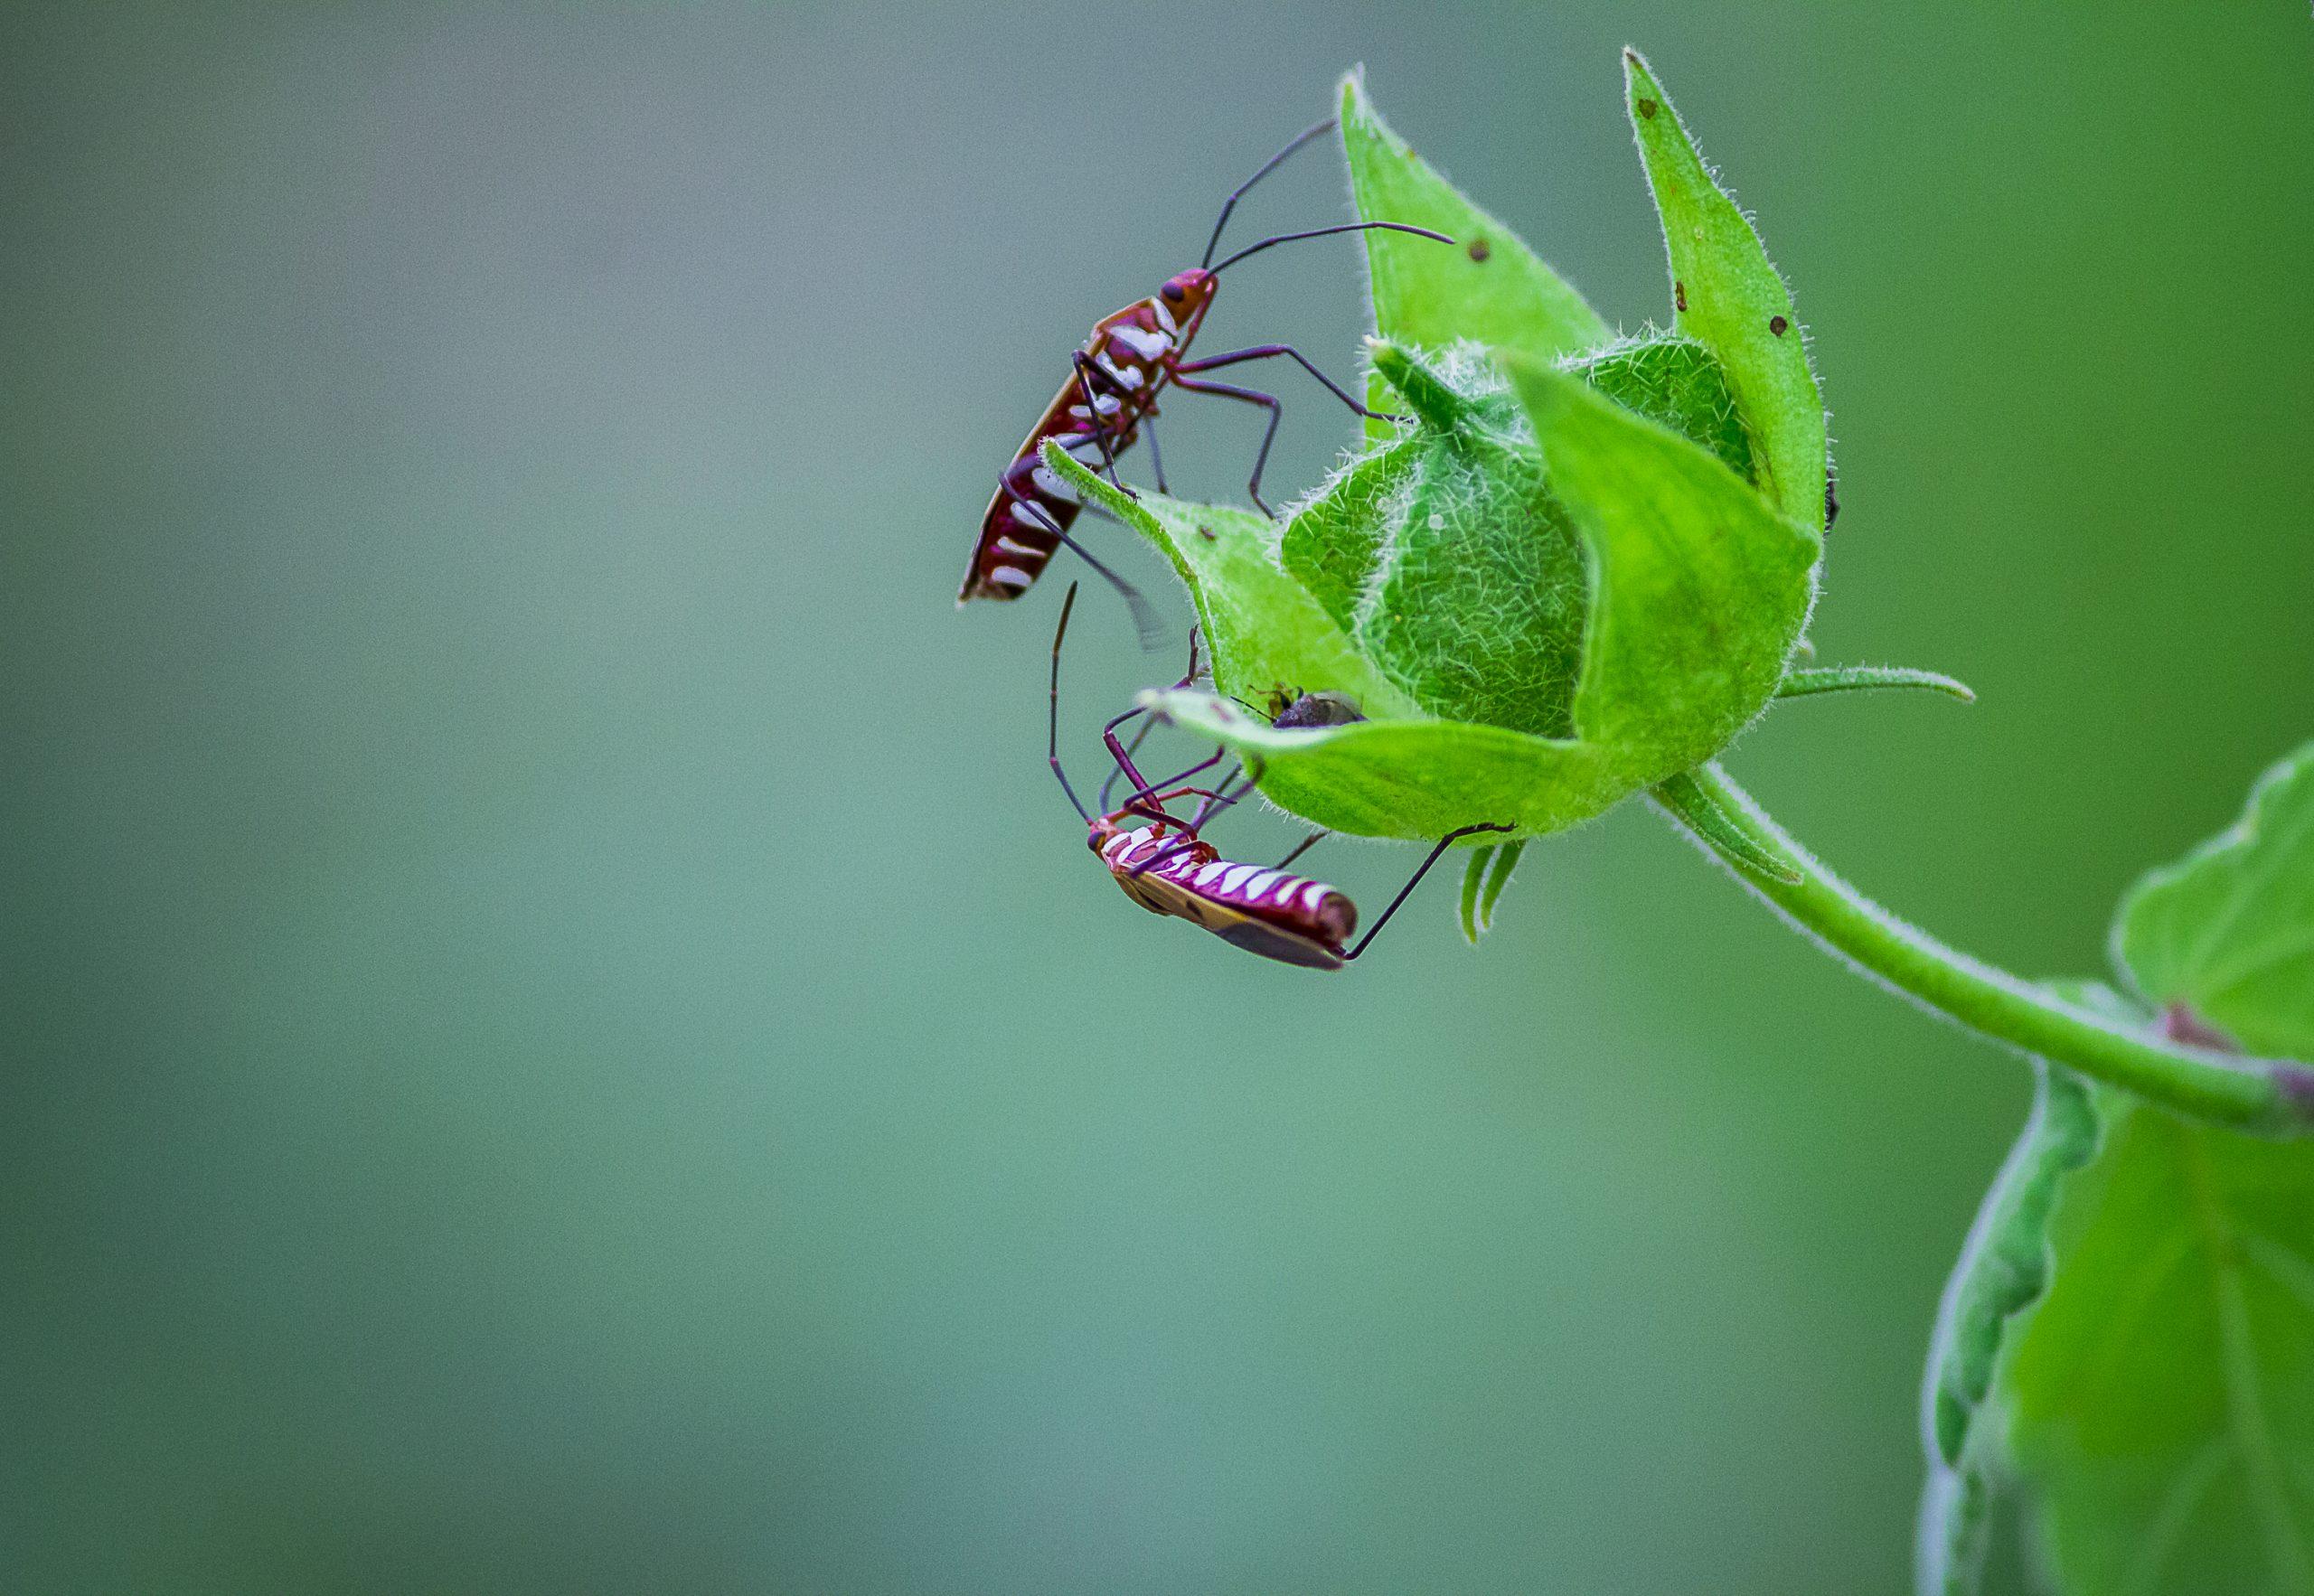 Stink Bugs on a Flower Bud